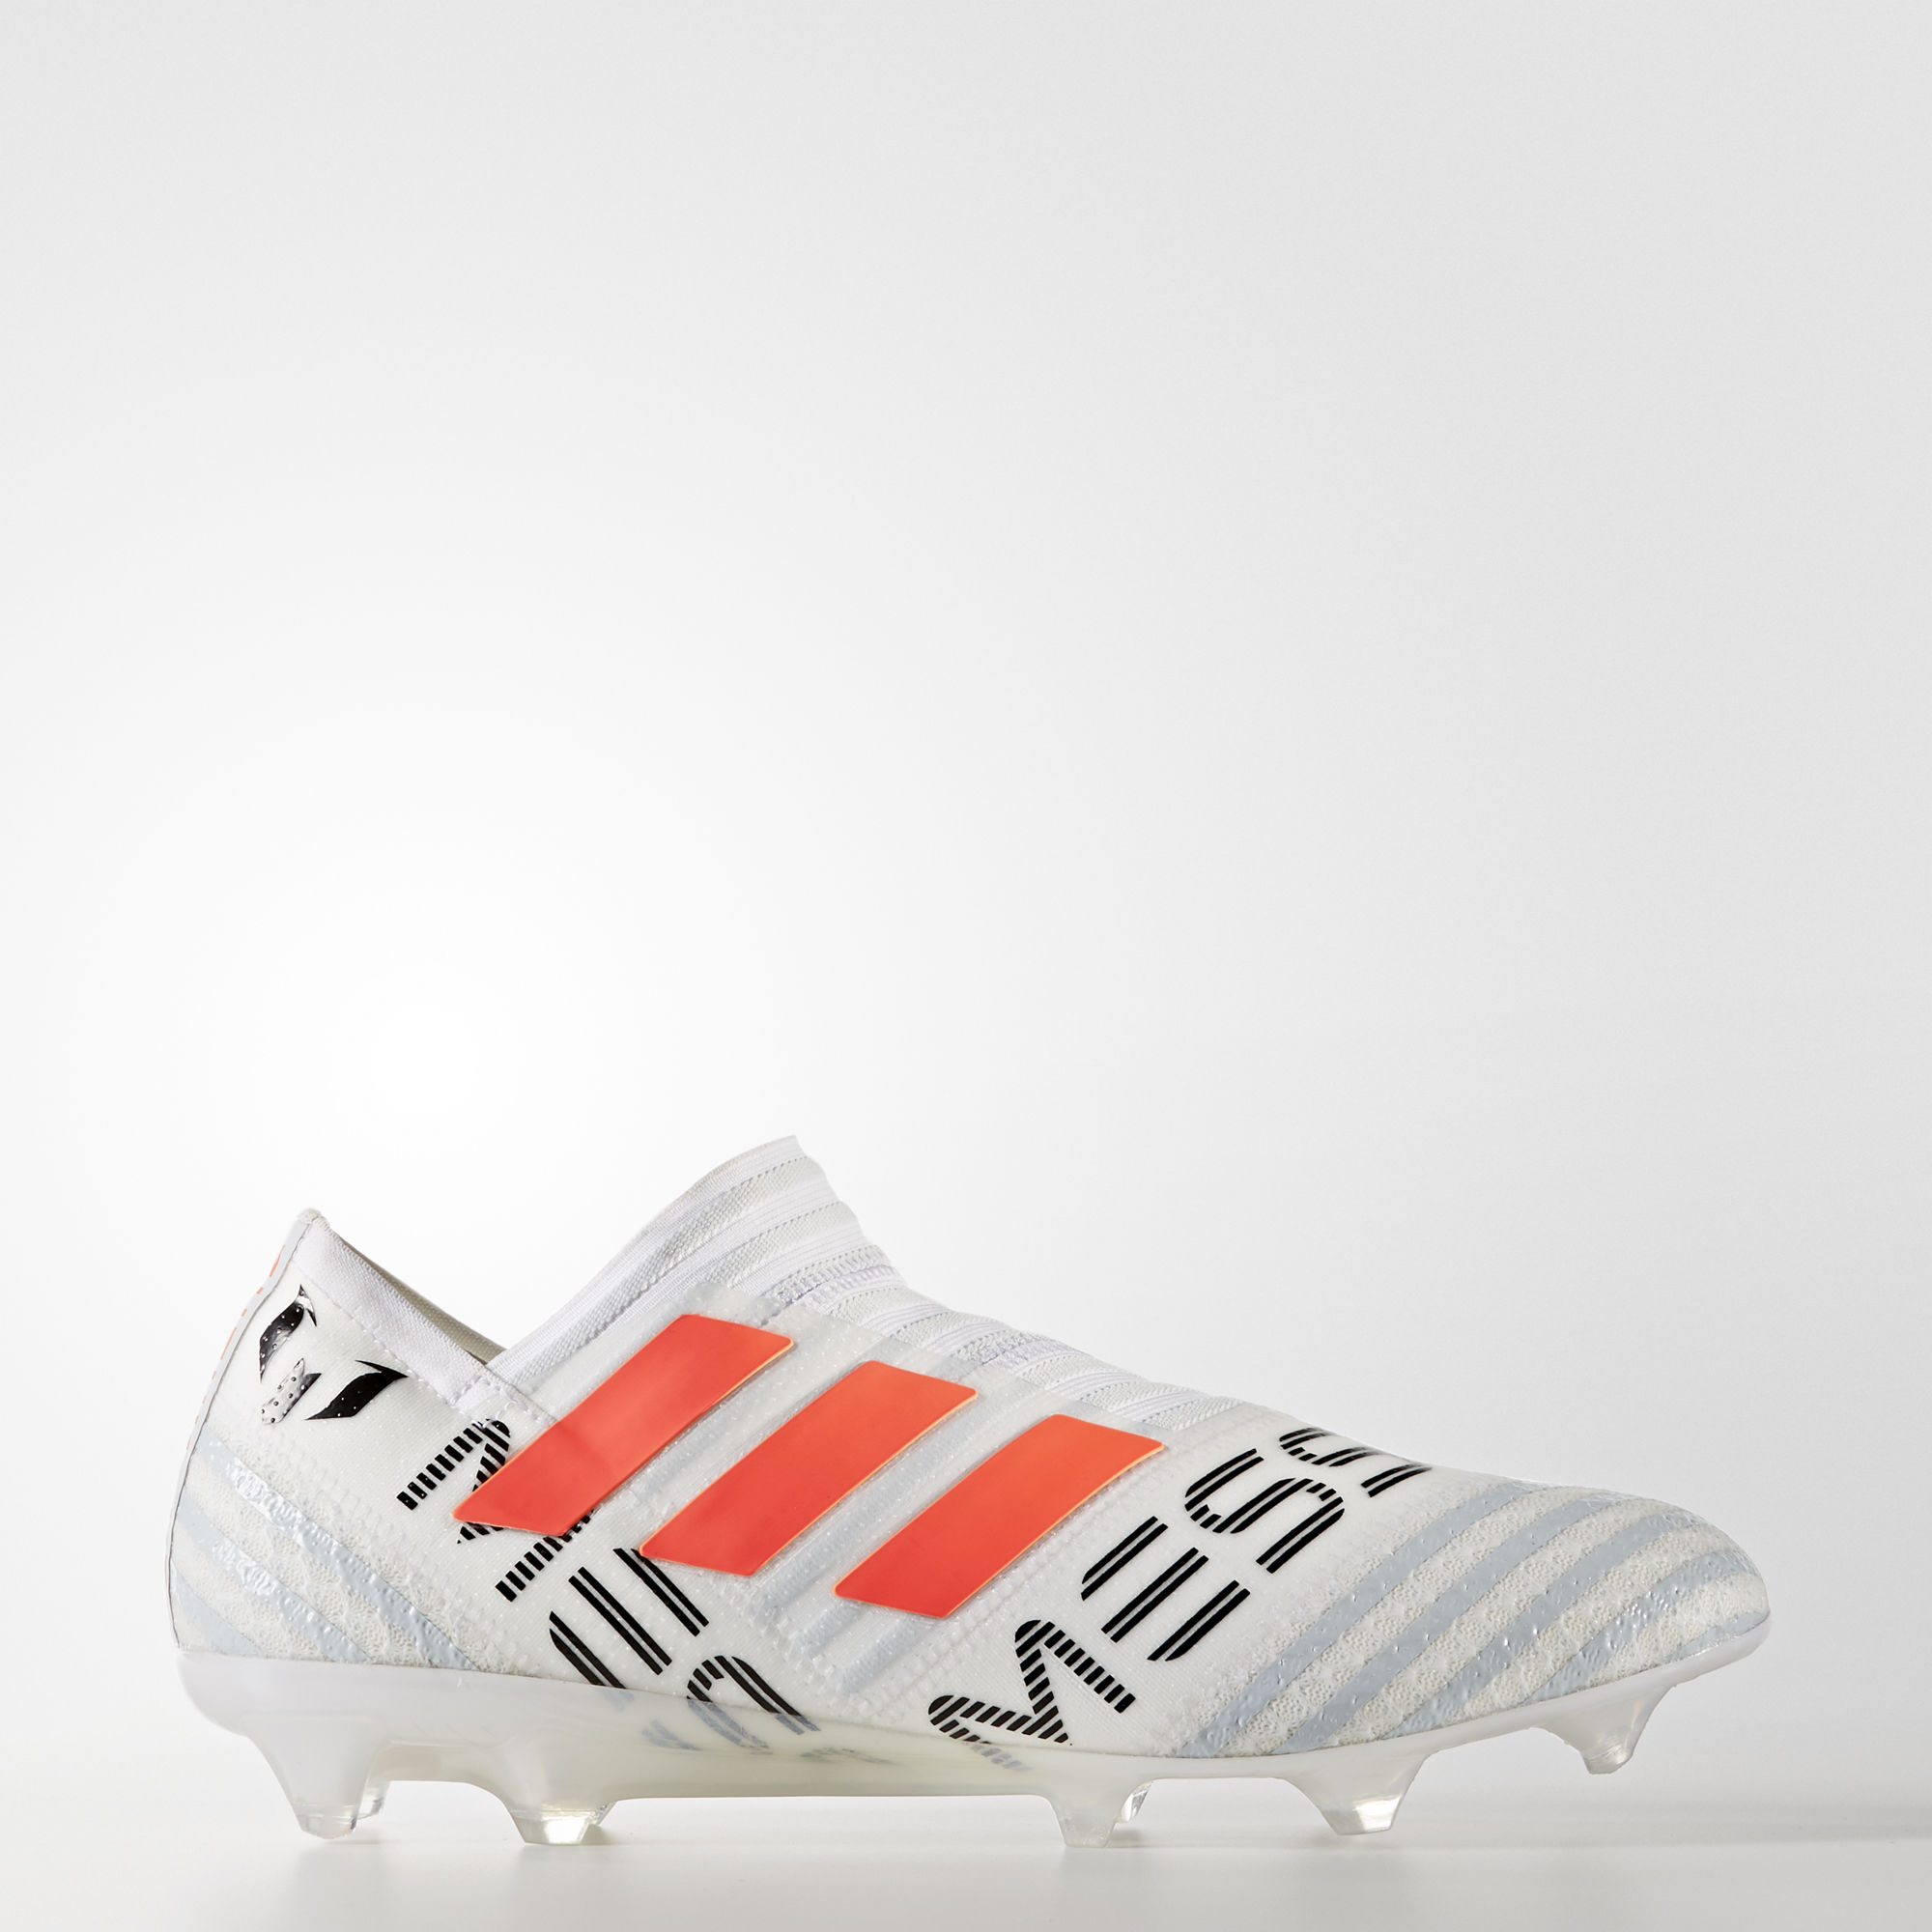 6ed755cc9d5 Click to enlarge image  adidas nemeziz messi 17 360 agility fg footwear white solar orange clear grey a.jpg  ...